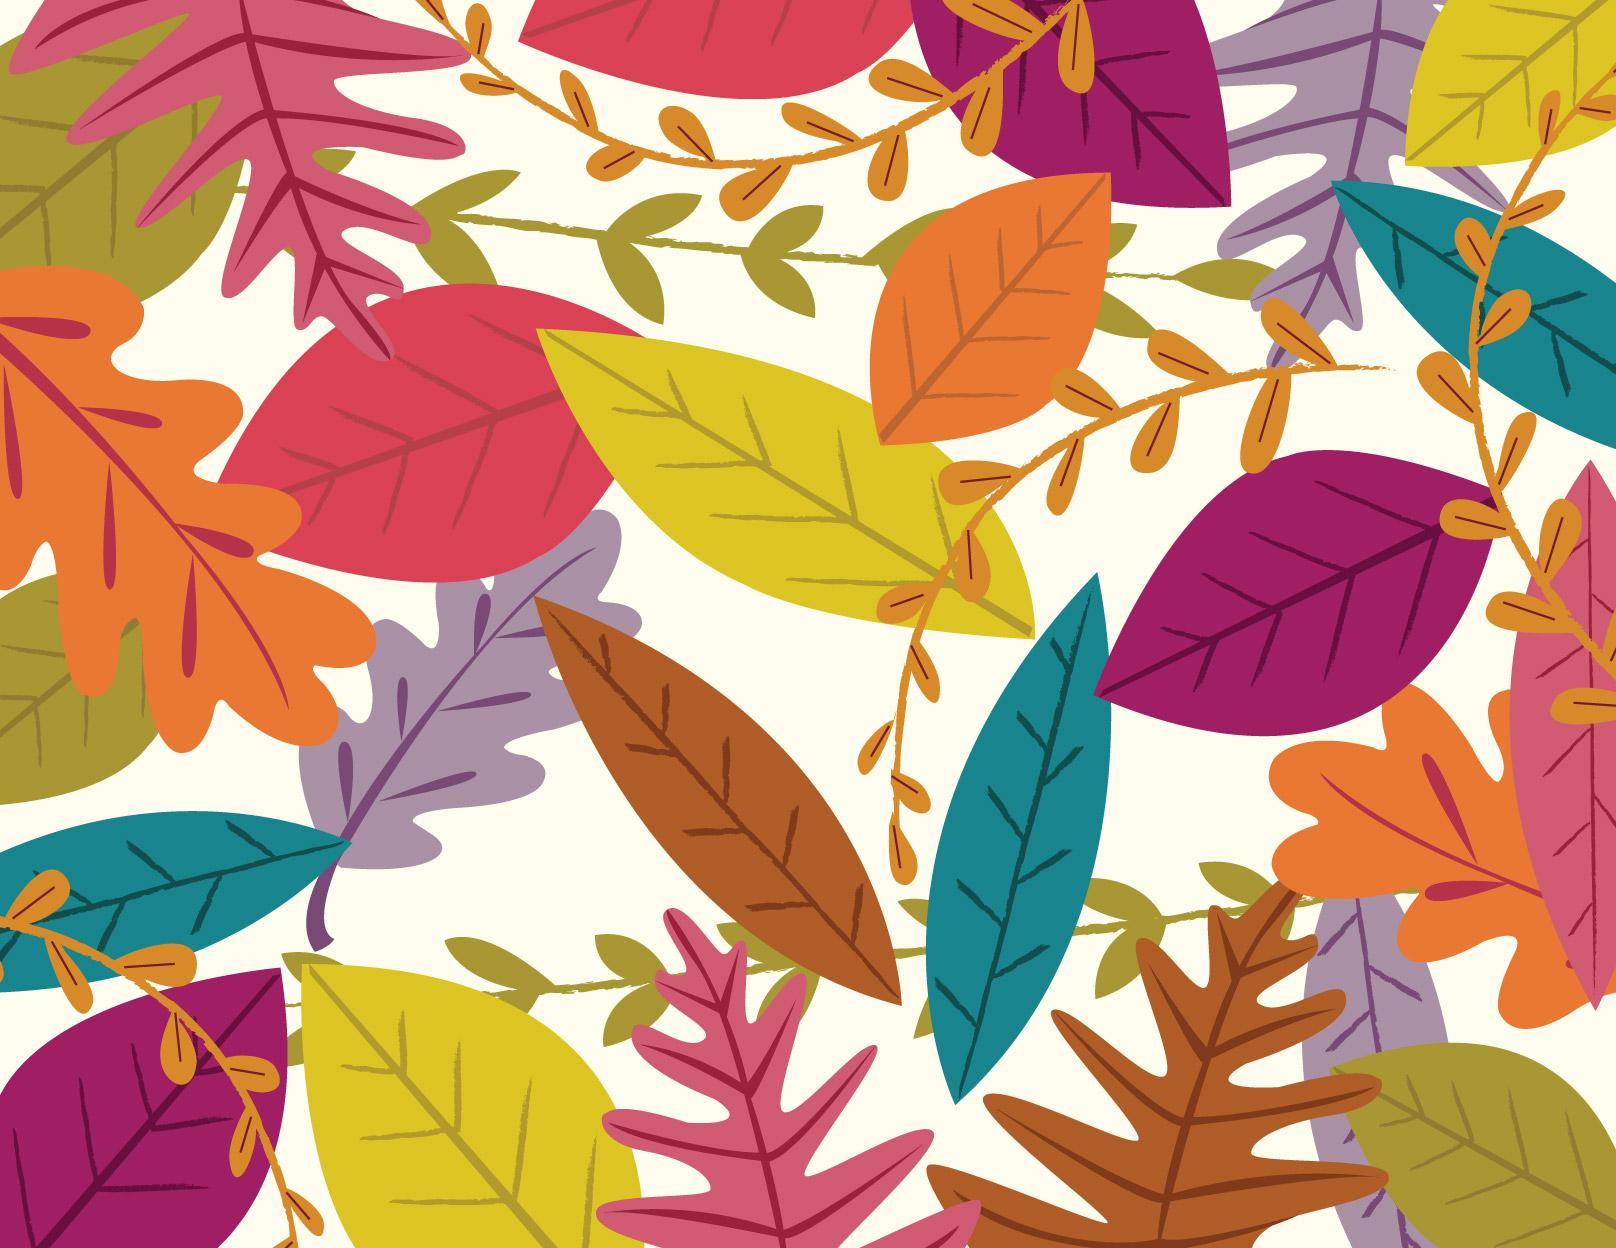 Autumn-Leaves-Blank.jpg